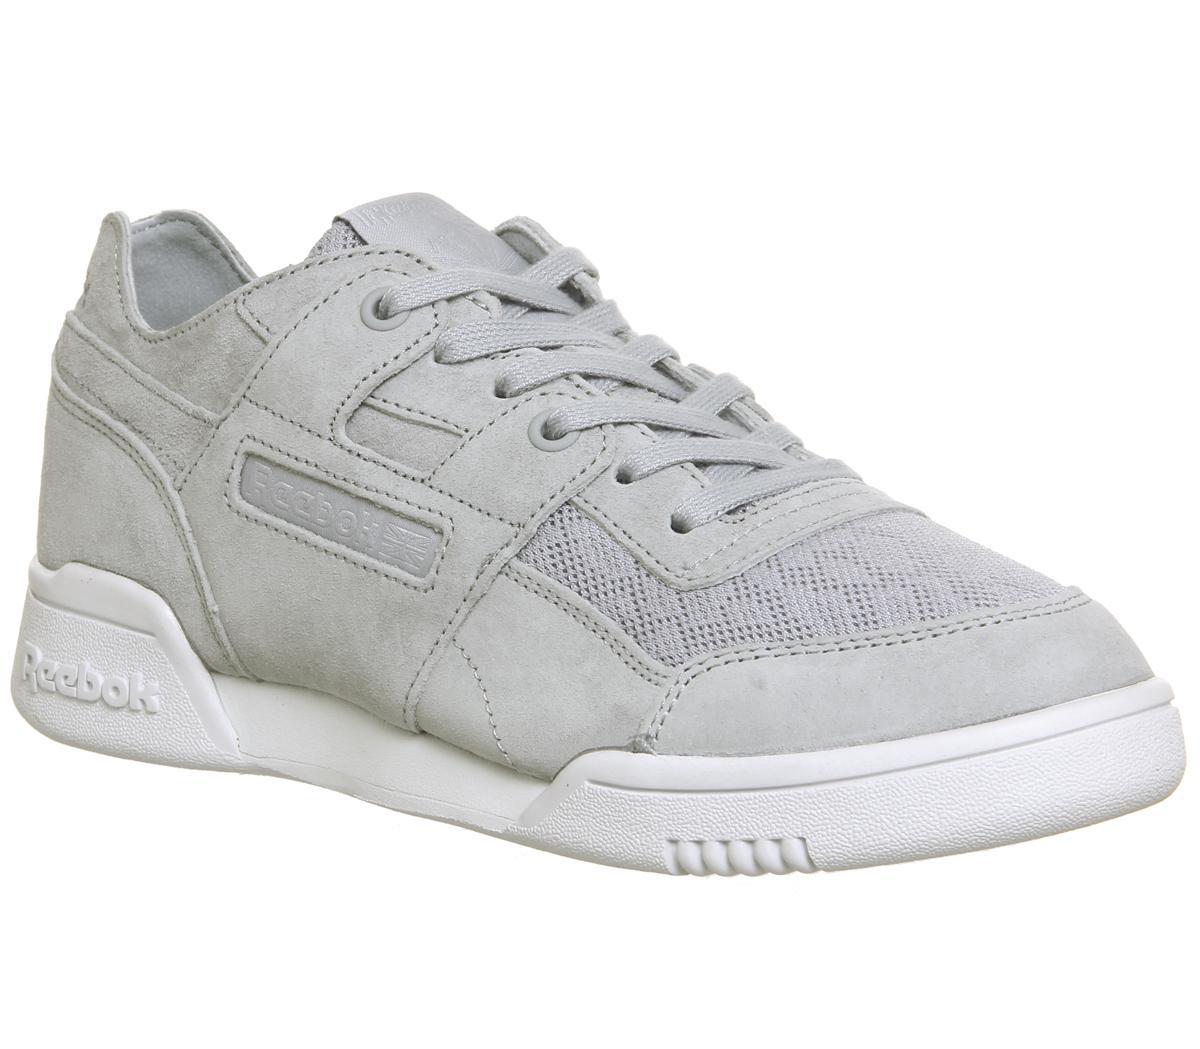 Reebok Workout Low Plus Trainers Cloud Grey White Sneaker